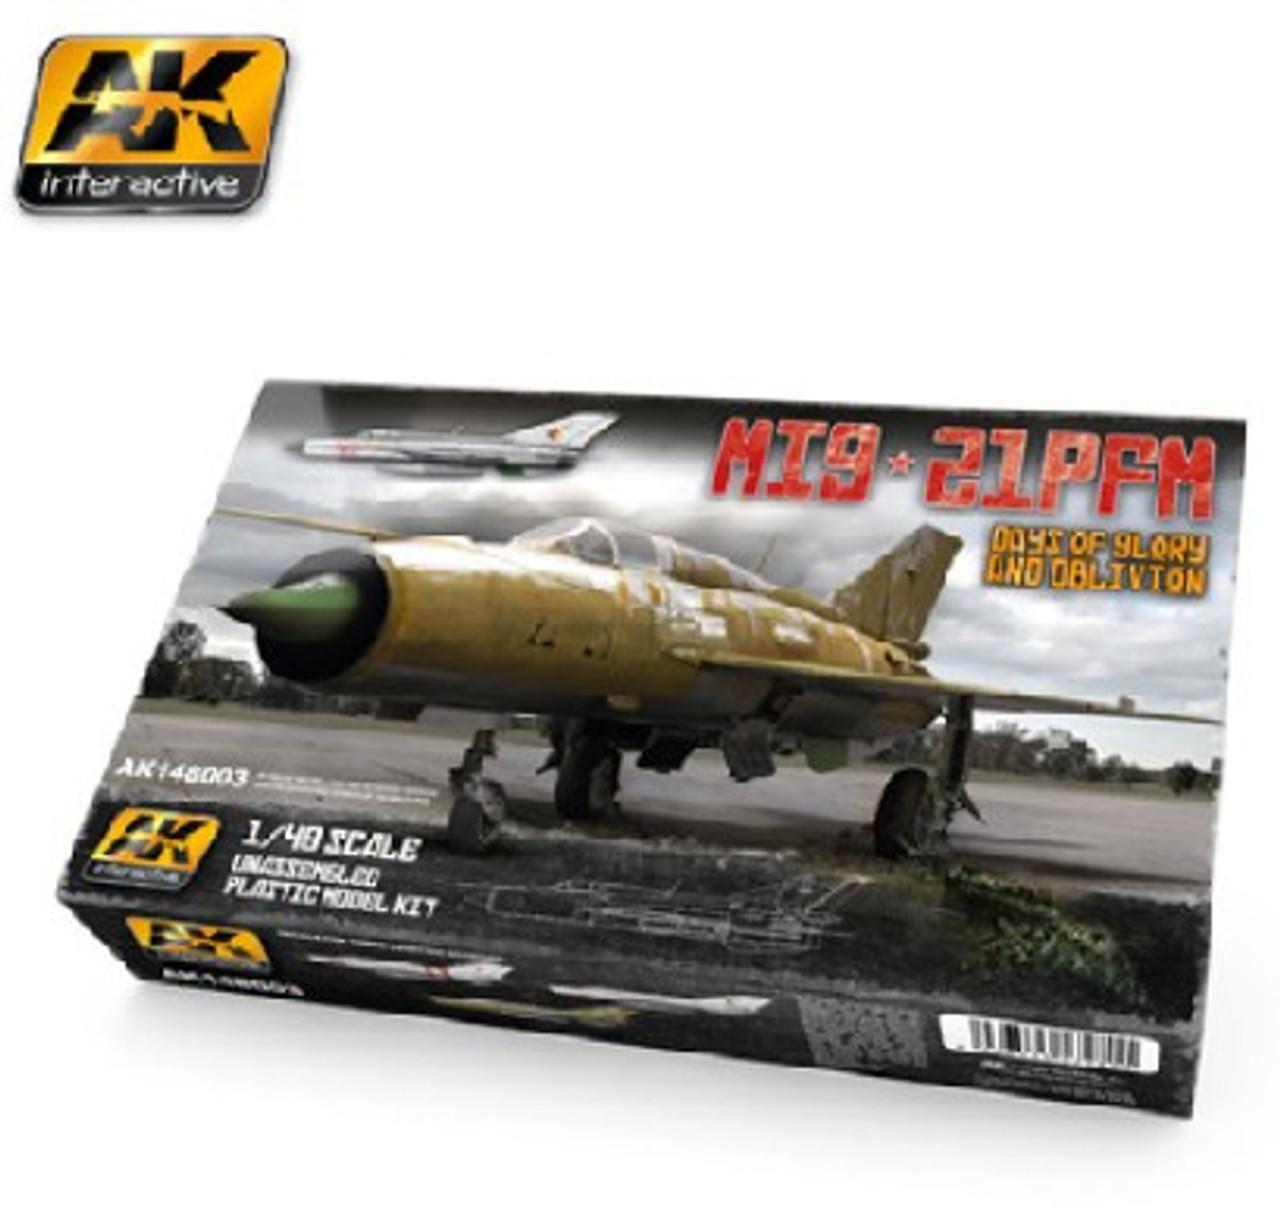 1/48 MiG21PFM Days of Glory & Oblivion Fighter (Plastic Kit)